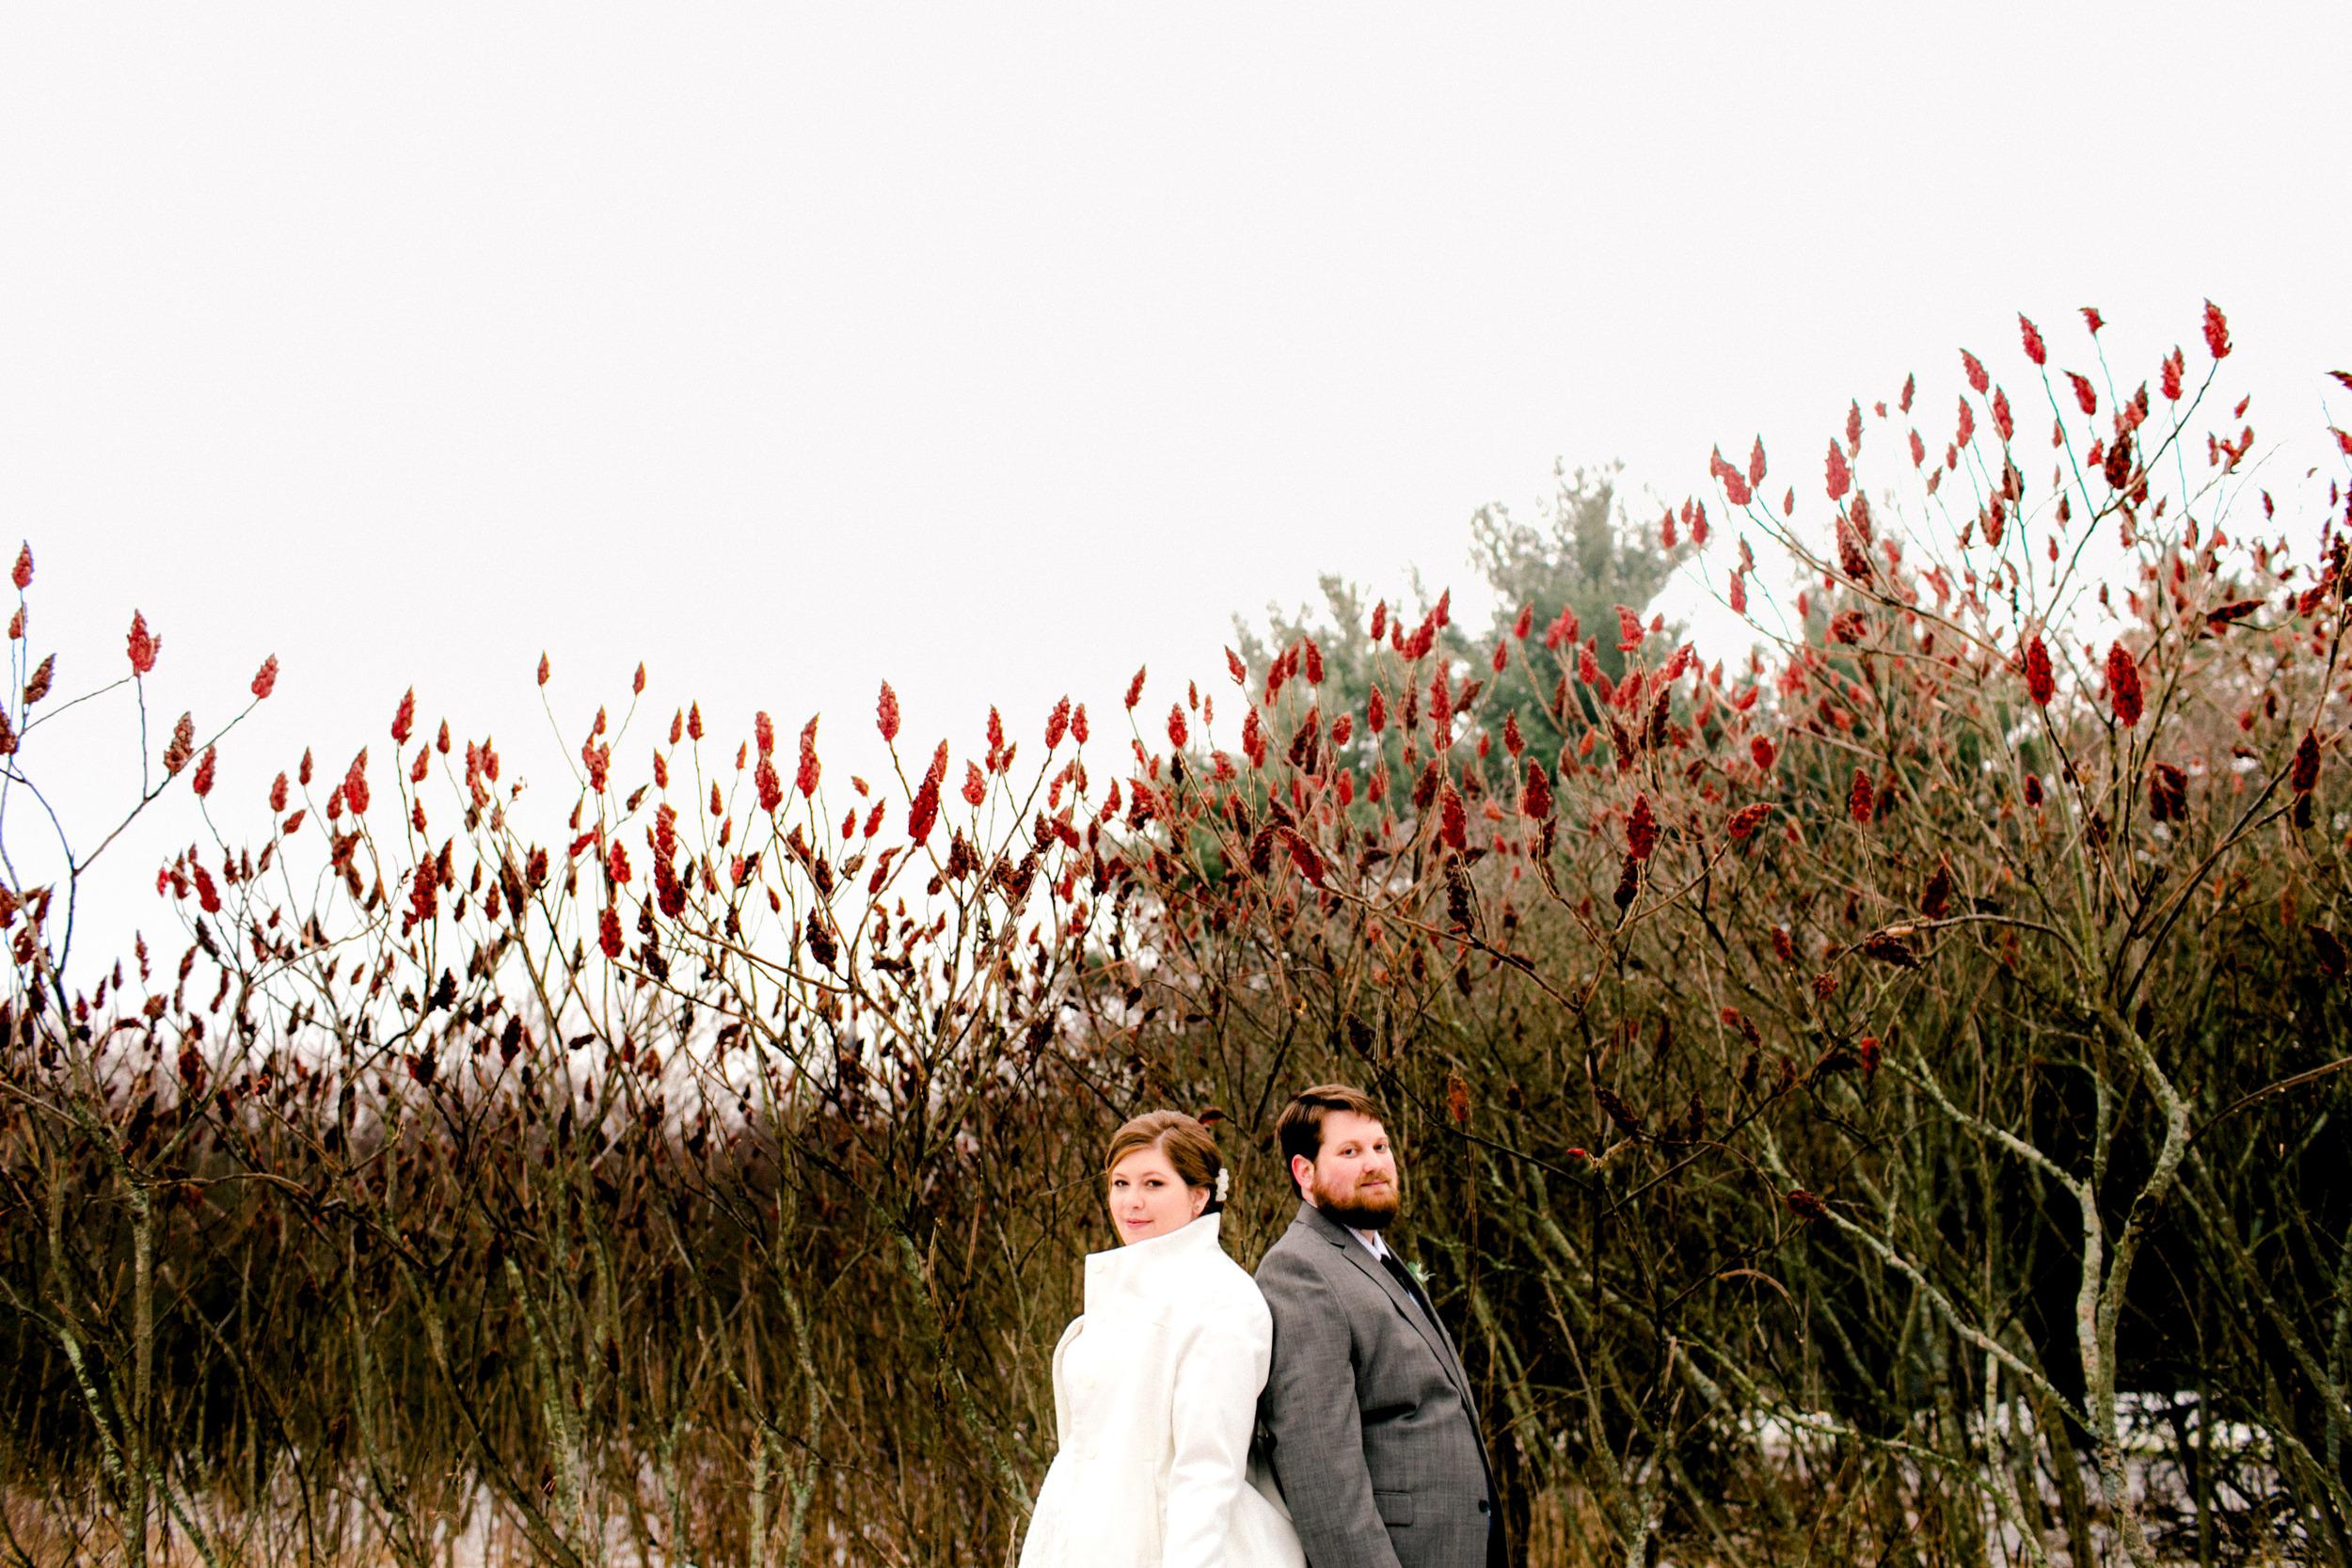 mayden photography_bridal portraits-33.jpg